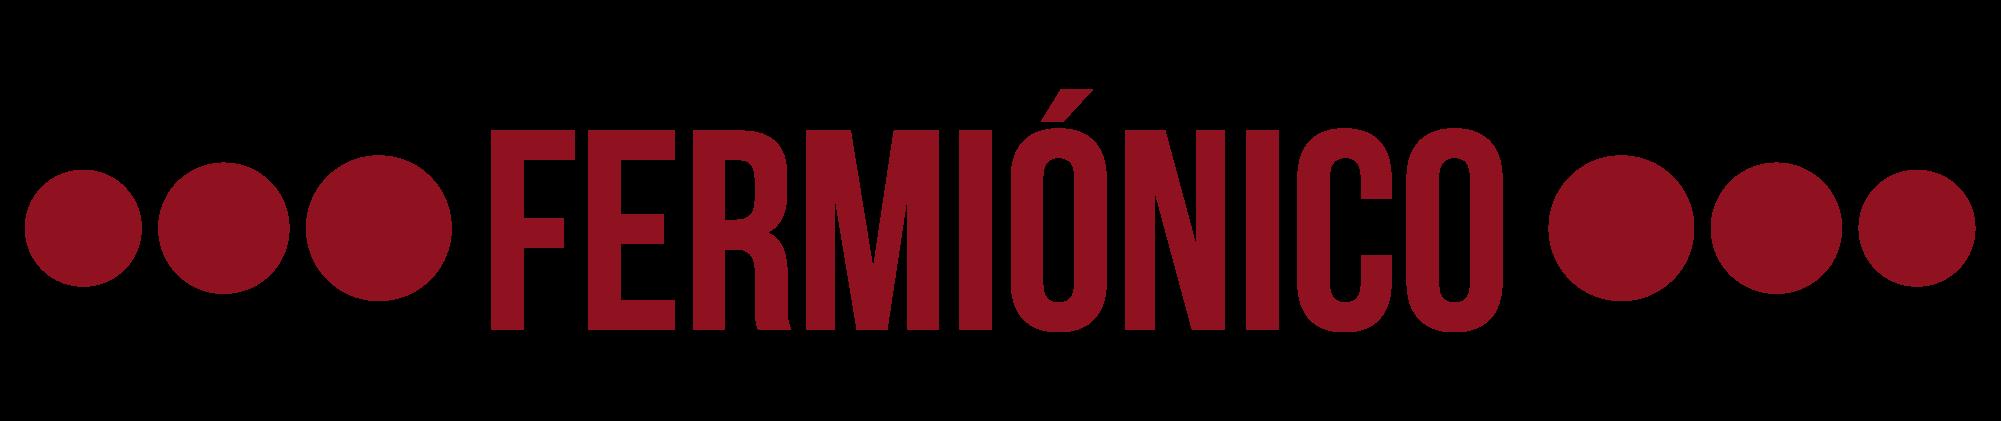 Firma Fermionico_Mesa de trabajo 16-13.png